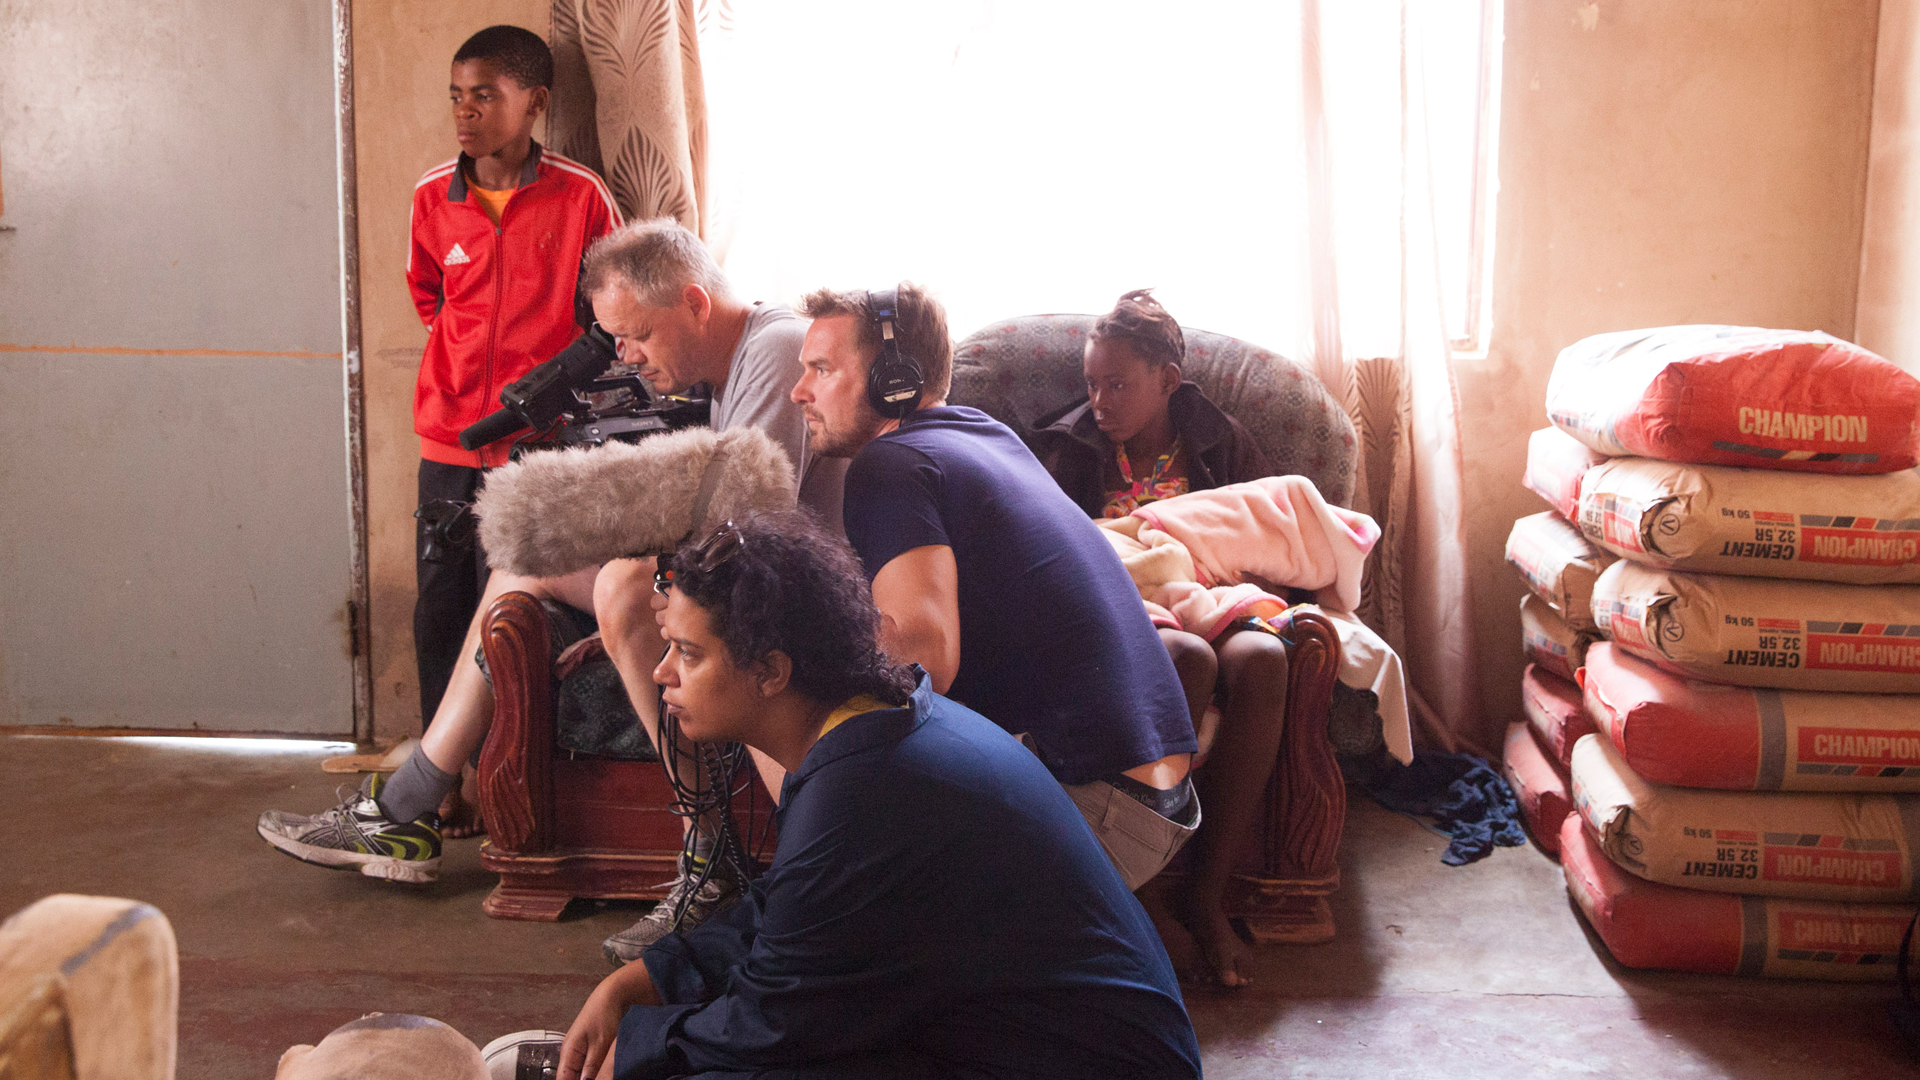 Arte Documentary - Queens of Botswana - Making of Image 2